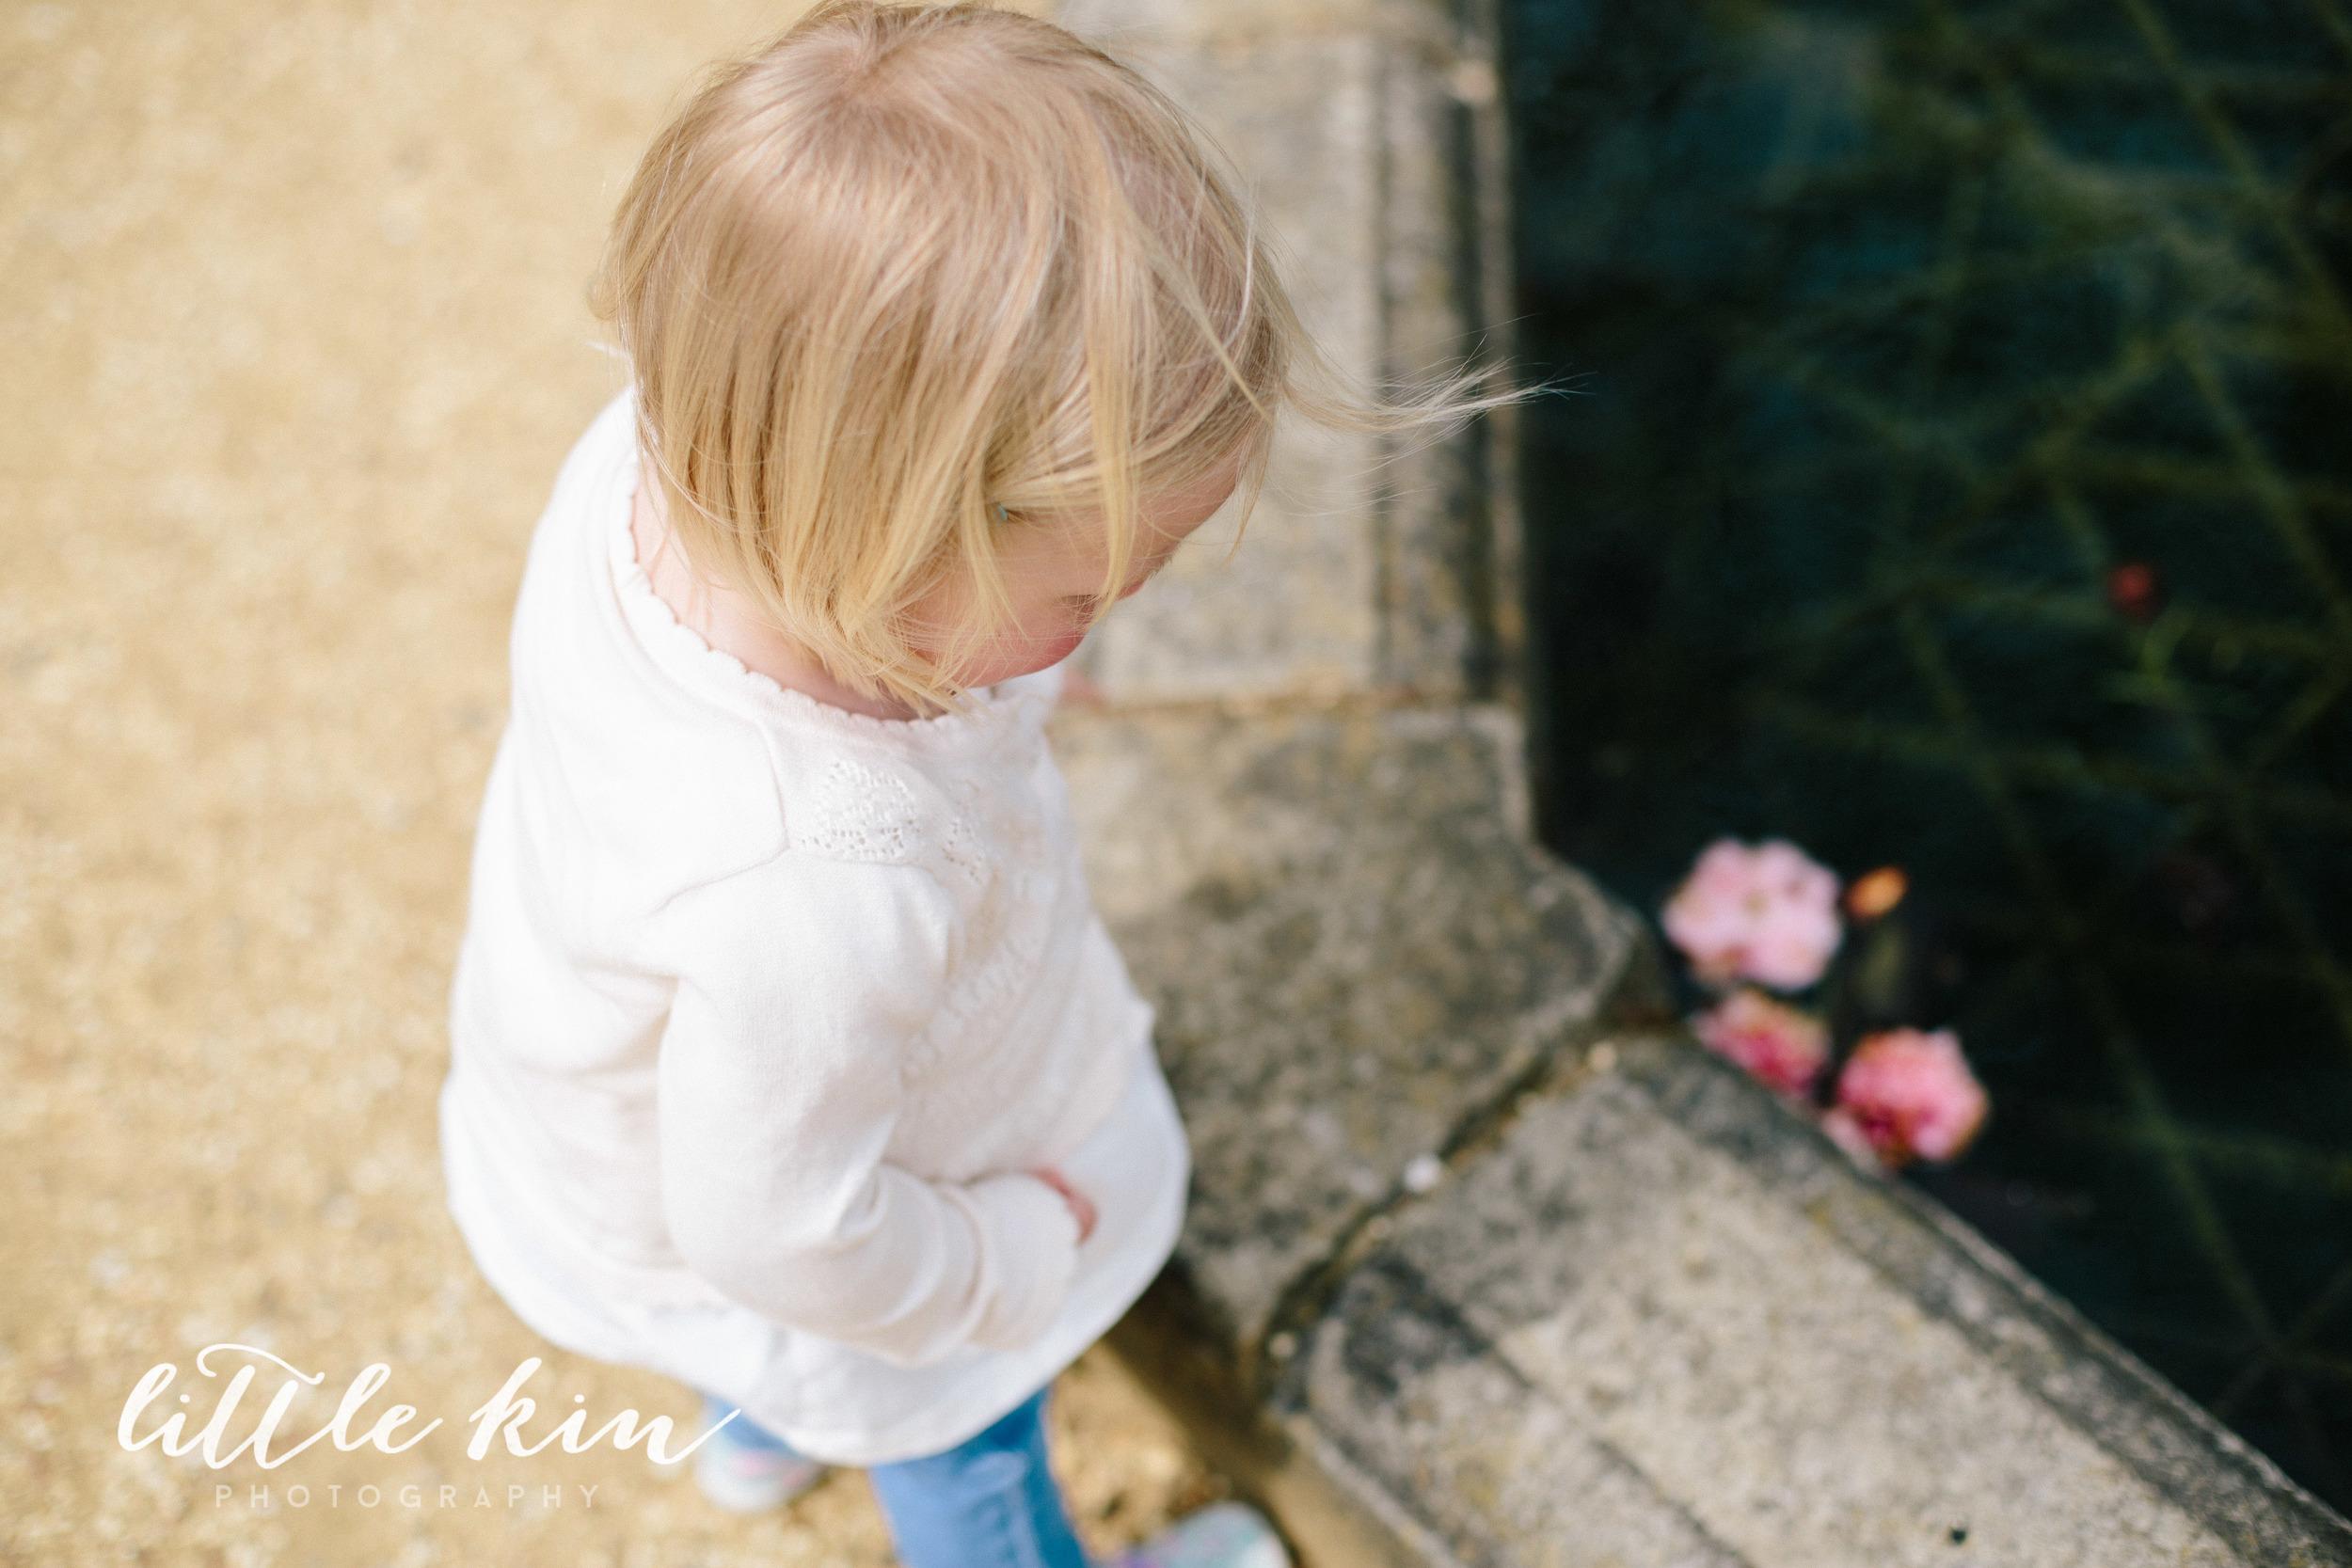 Amalia_LittleKinPhotography_media-4.jpg